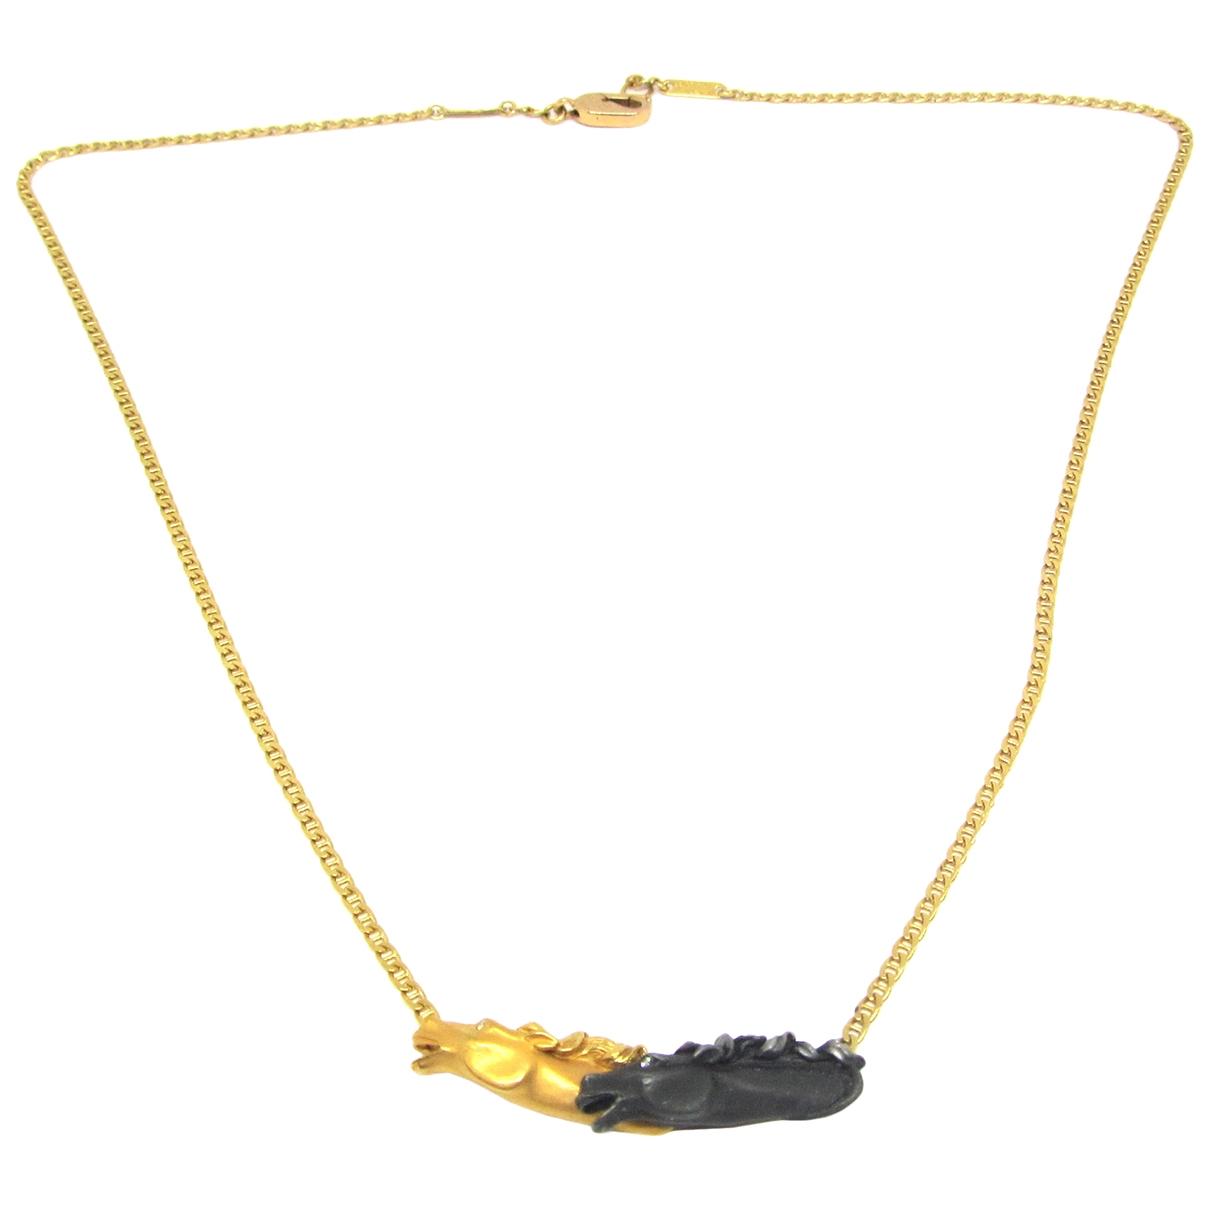 Carrera Y Carrera - Collier   pour femme en or jaune